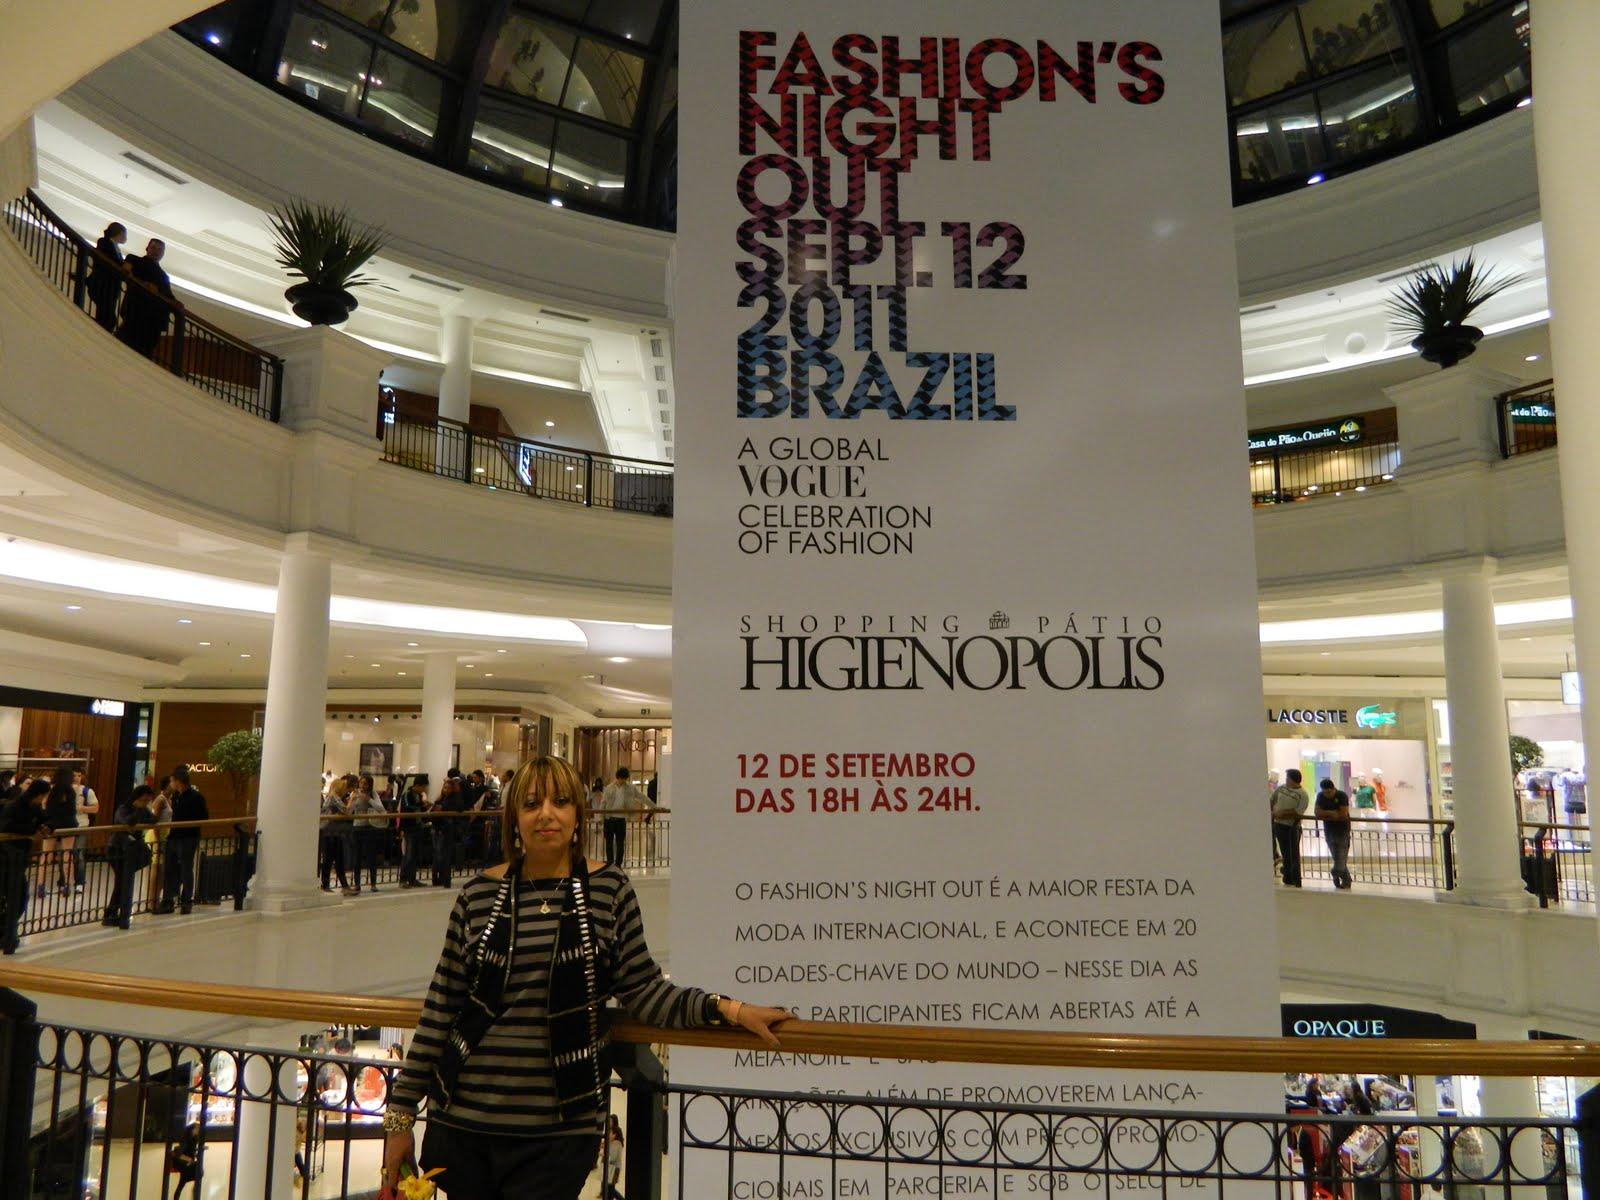 LUXOS E LUXOS NO FASHION S NIGHT OUT BRASIL 2011 NO SHOPPING PÁTIO ... 14c1c81234